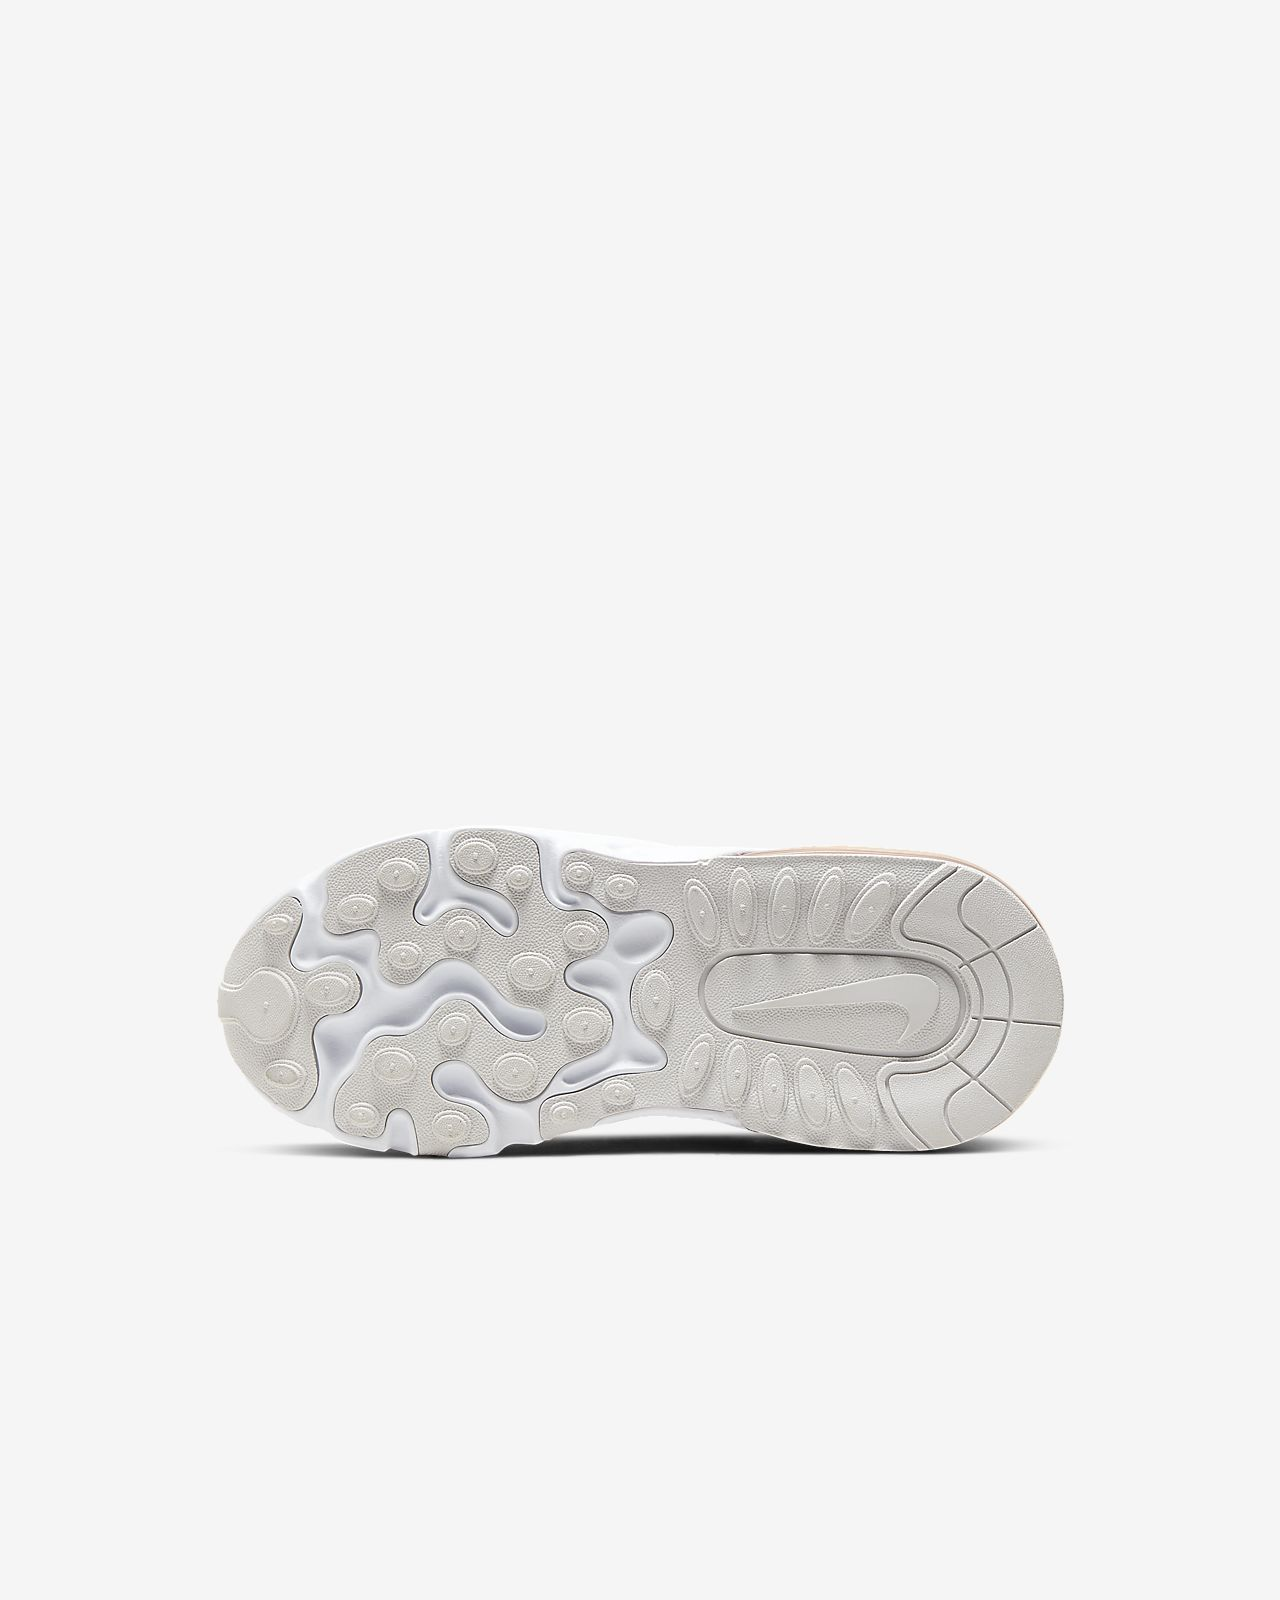 Nike Air Max 270 RT sko til små børn